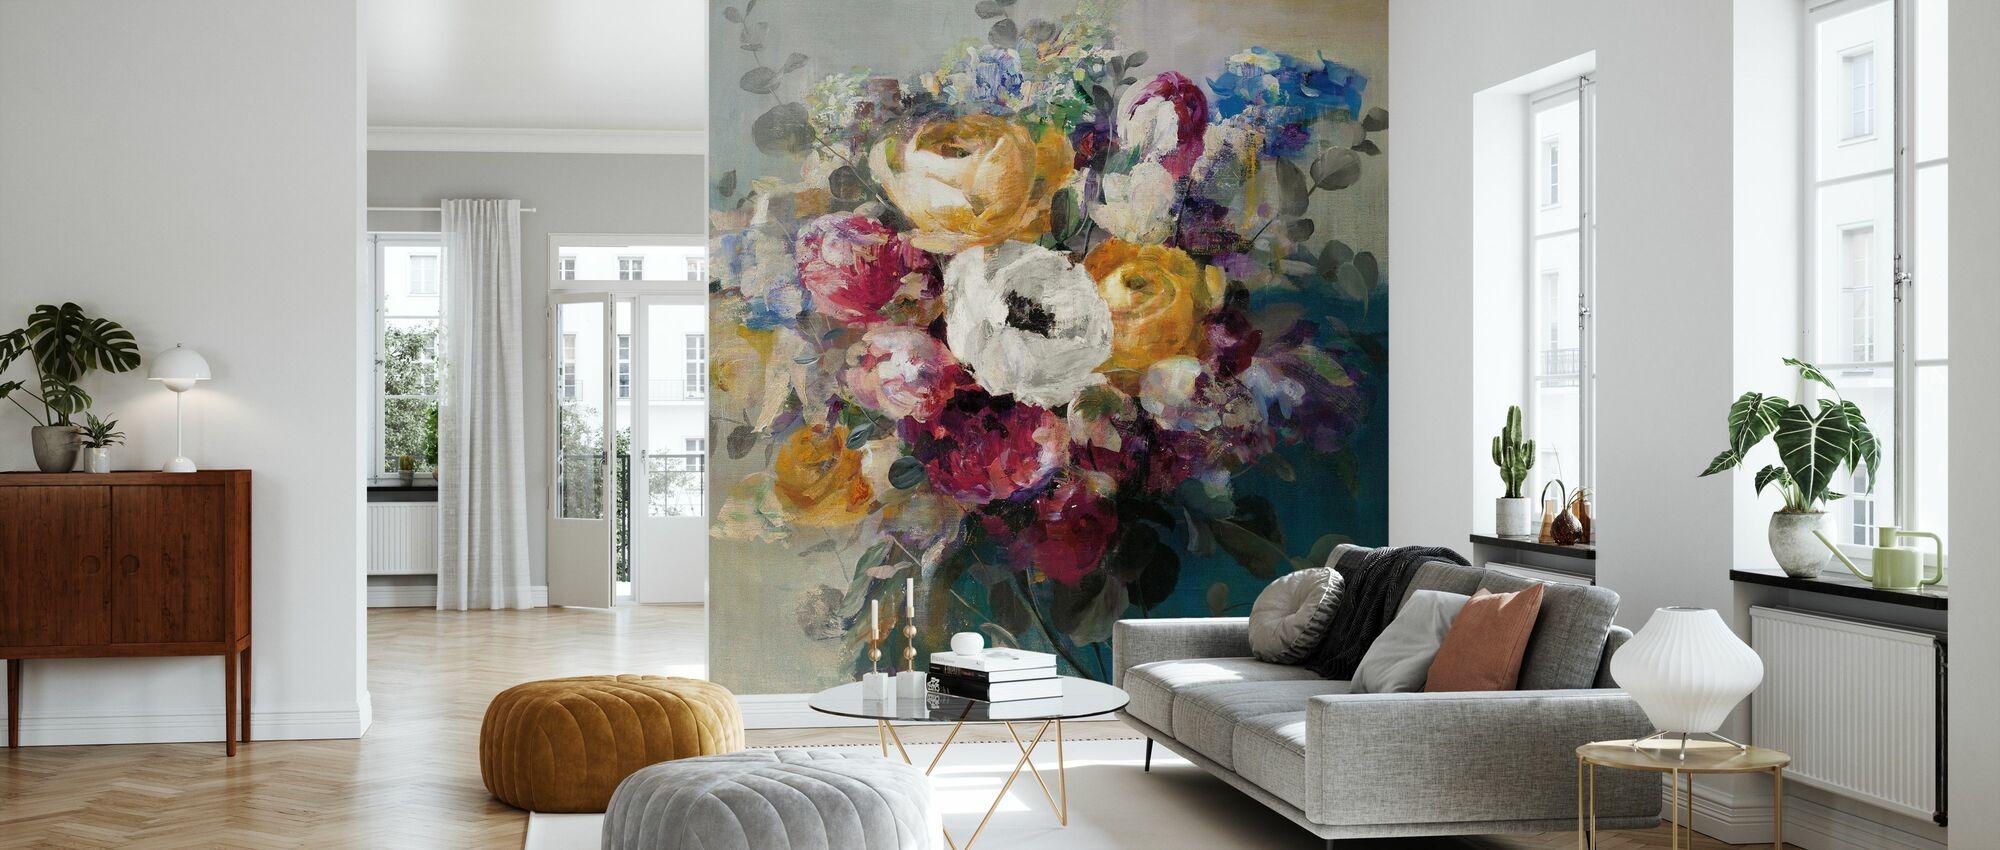 Fall Bouquet - Wallpaper - Living Room